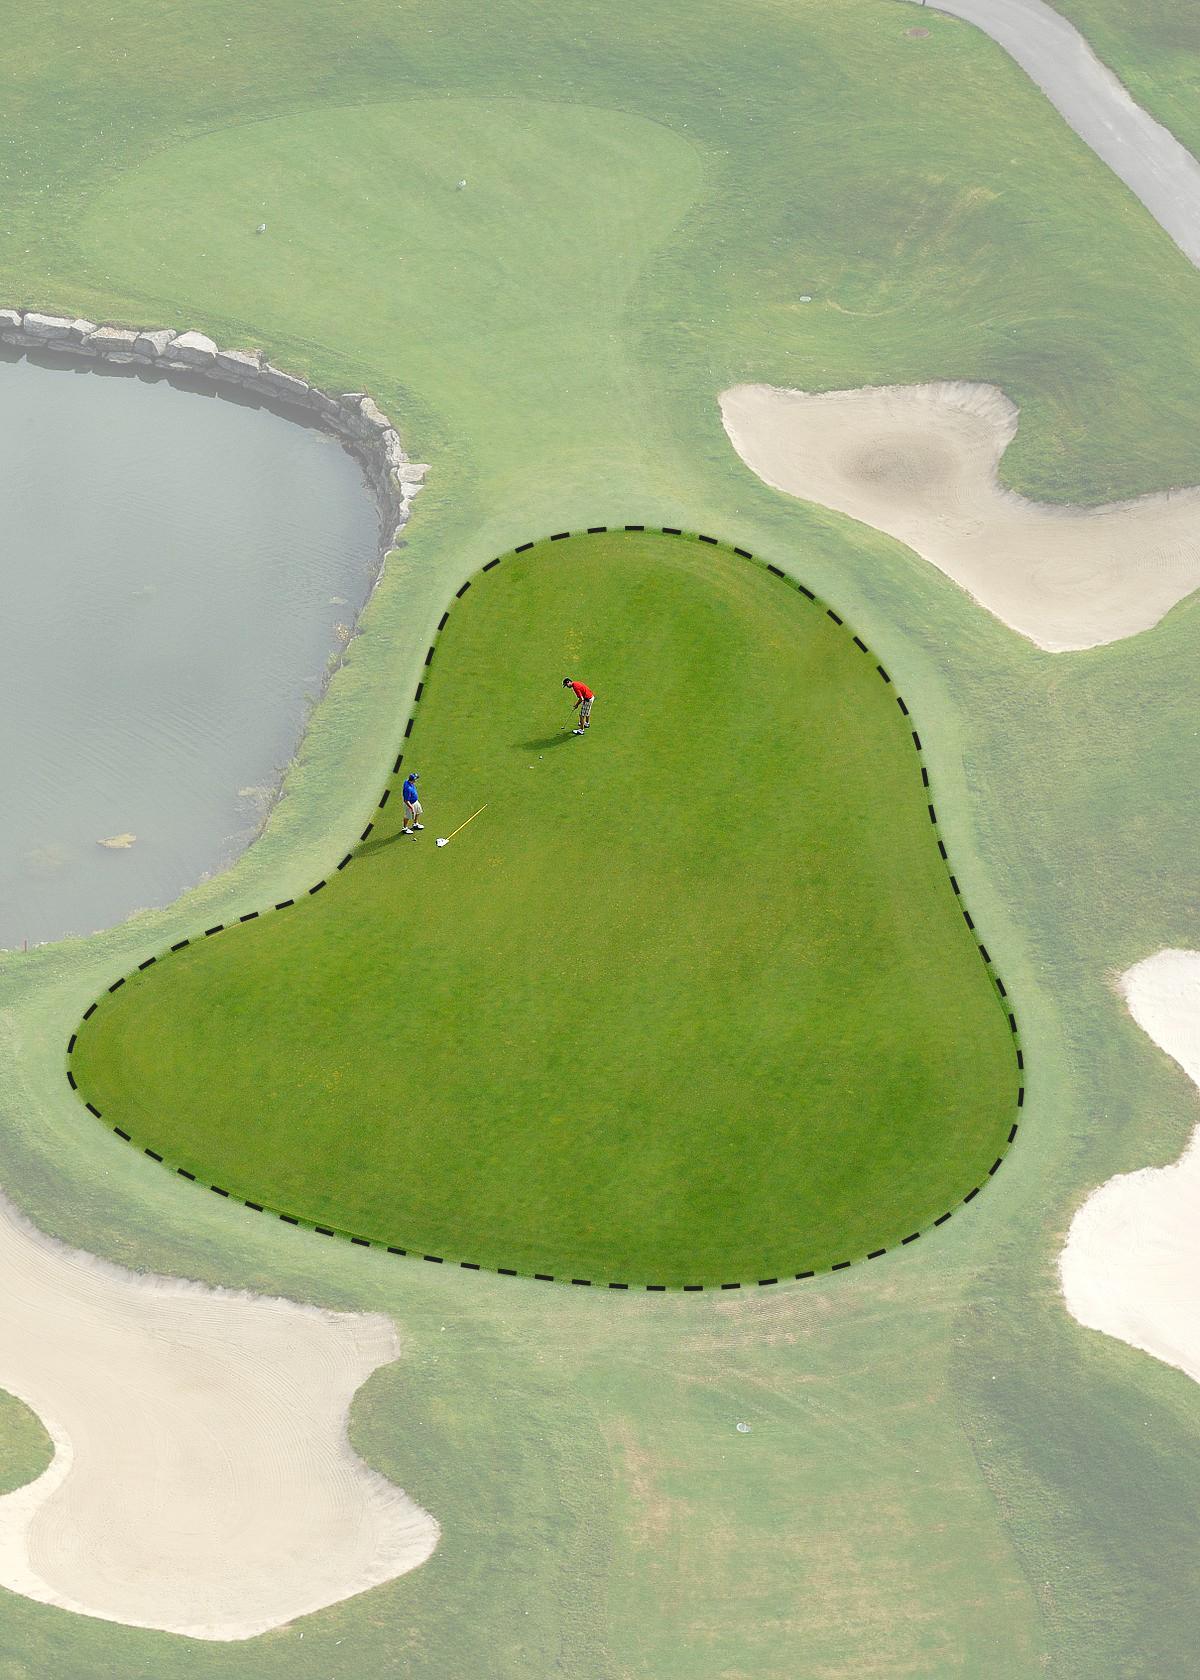 A_Golf_Course_hervorhebung